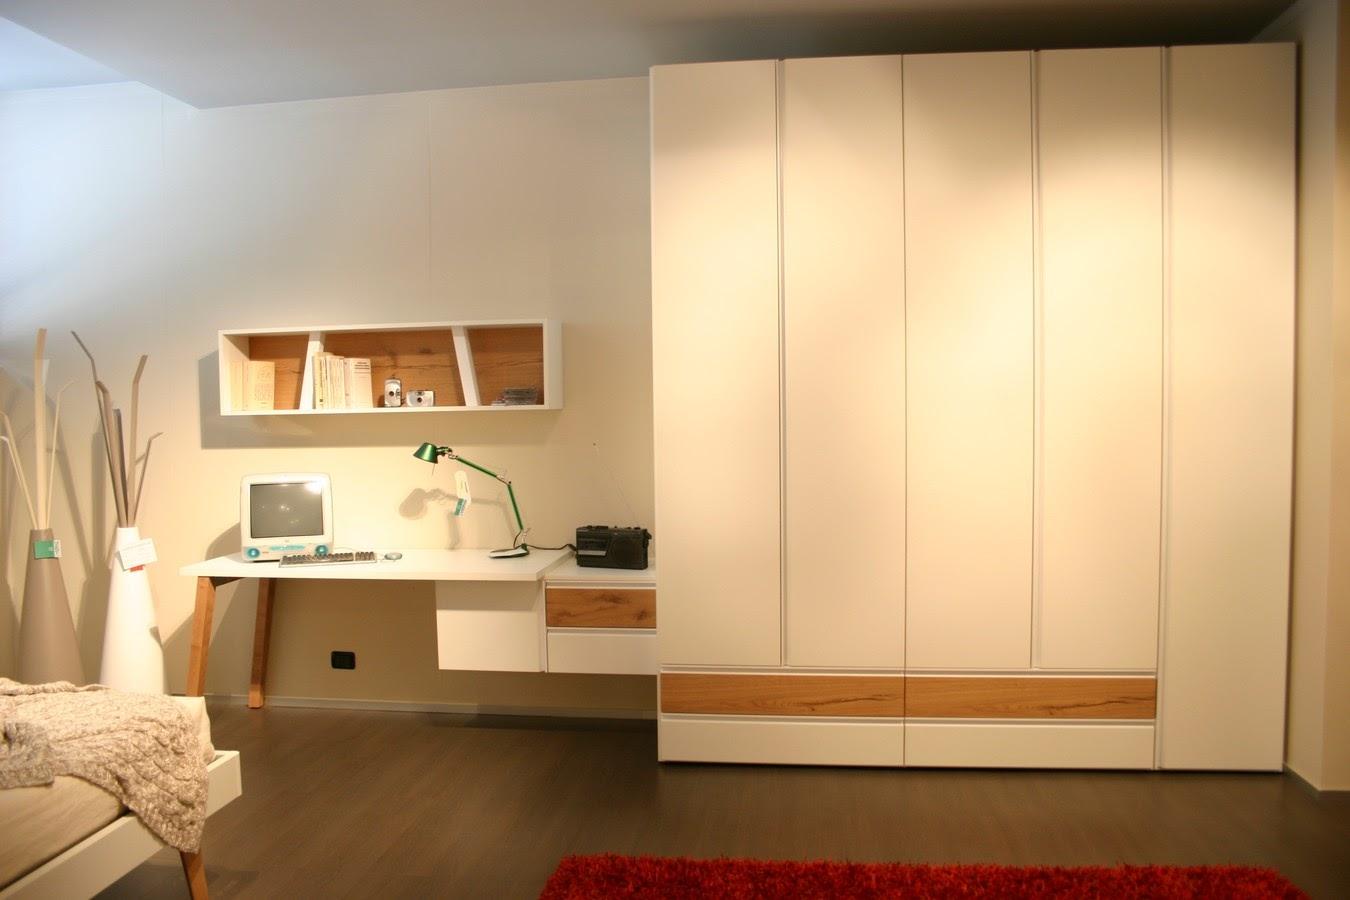 Stanzette Per Bambini Ikea Elegant Camerette Per Ragazzi Ikea With